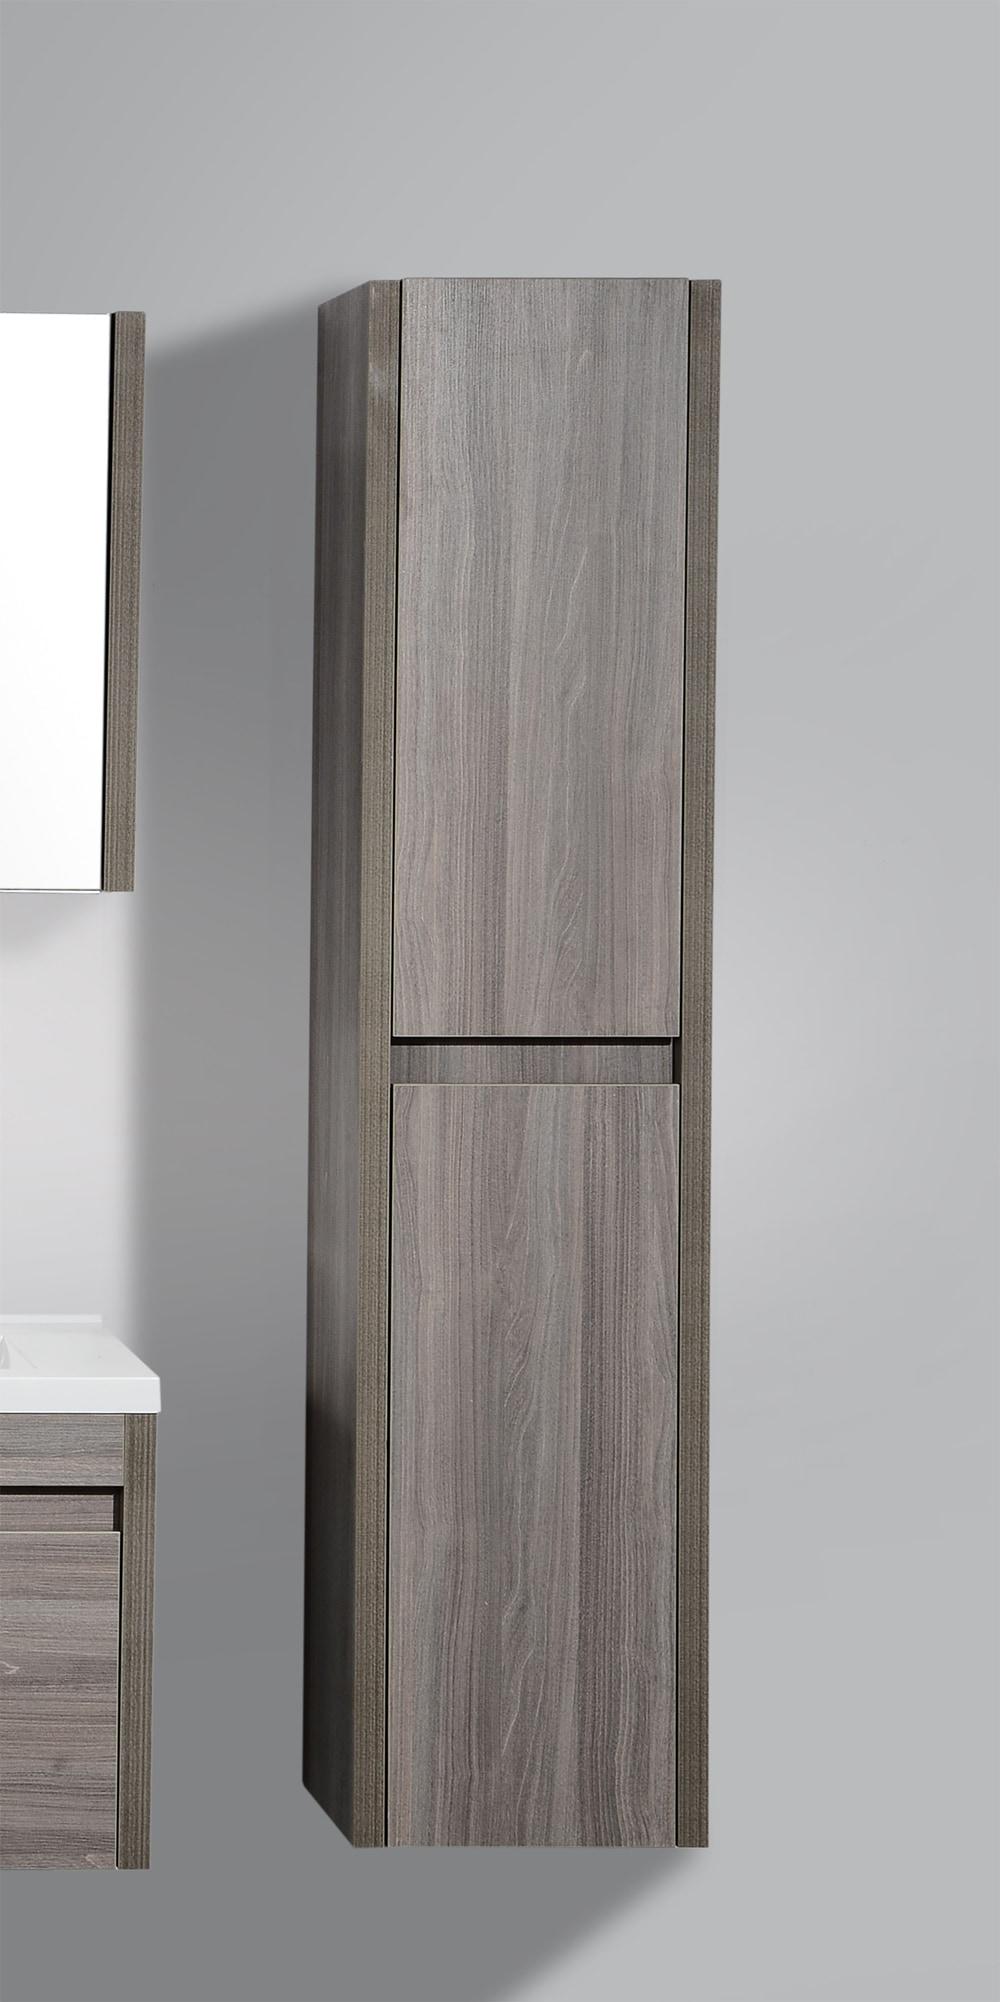 "Modern / 15.75"" x 13.8"" x 70"" / Wall-Hung / Maple Grey Wood Imitation / Soft-Closing / Melamine Bathroom Side Cabinets - Labrador Maple Grey Collection 0"